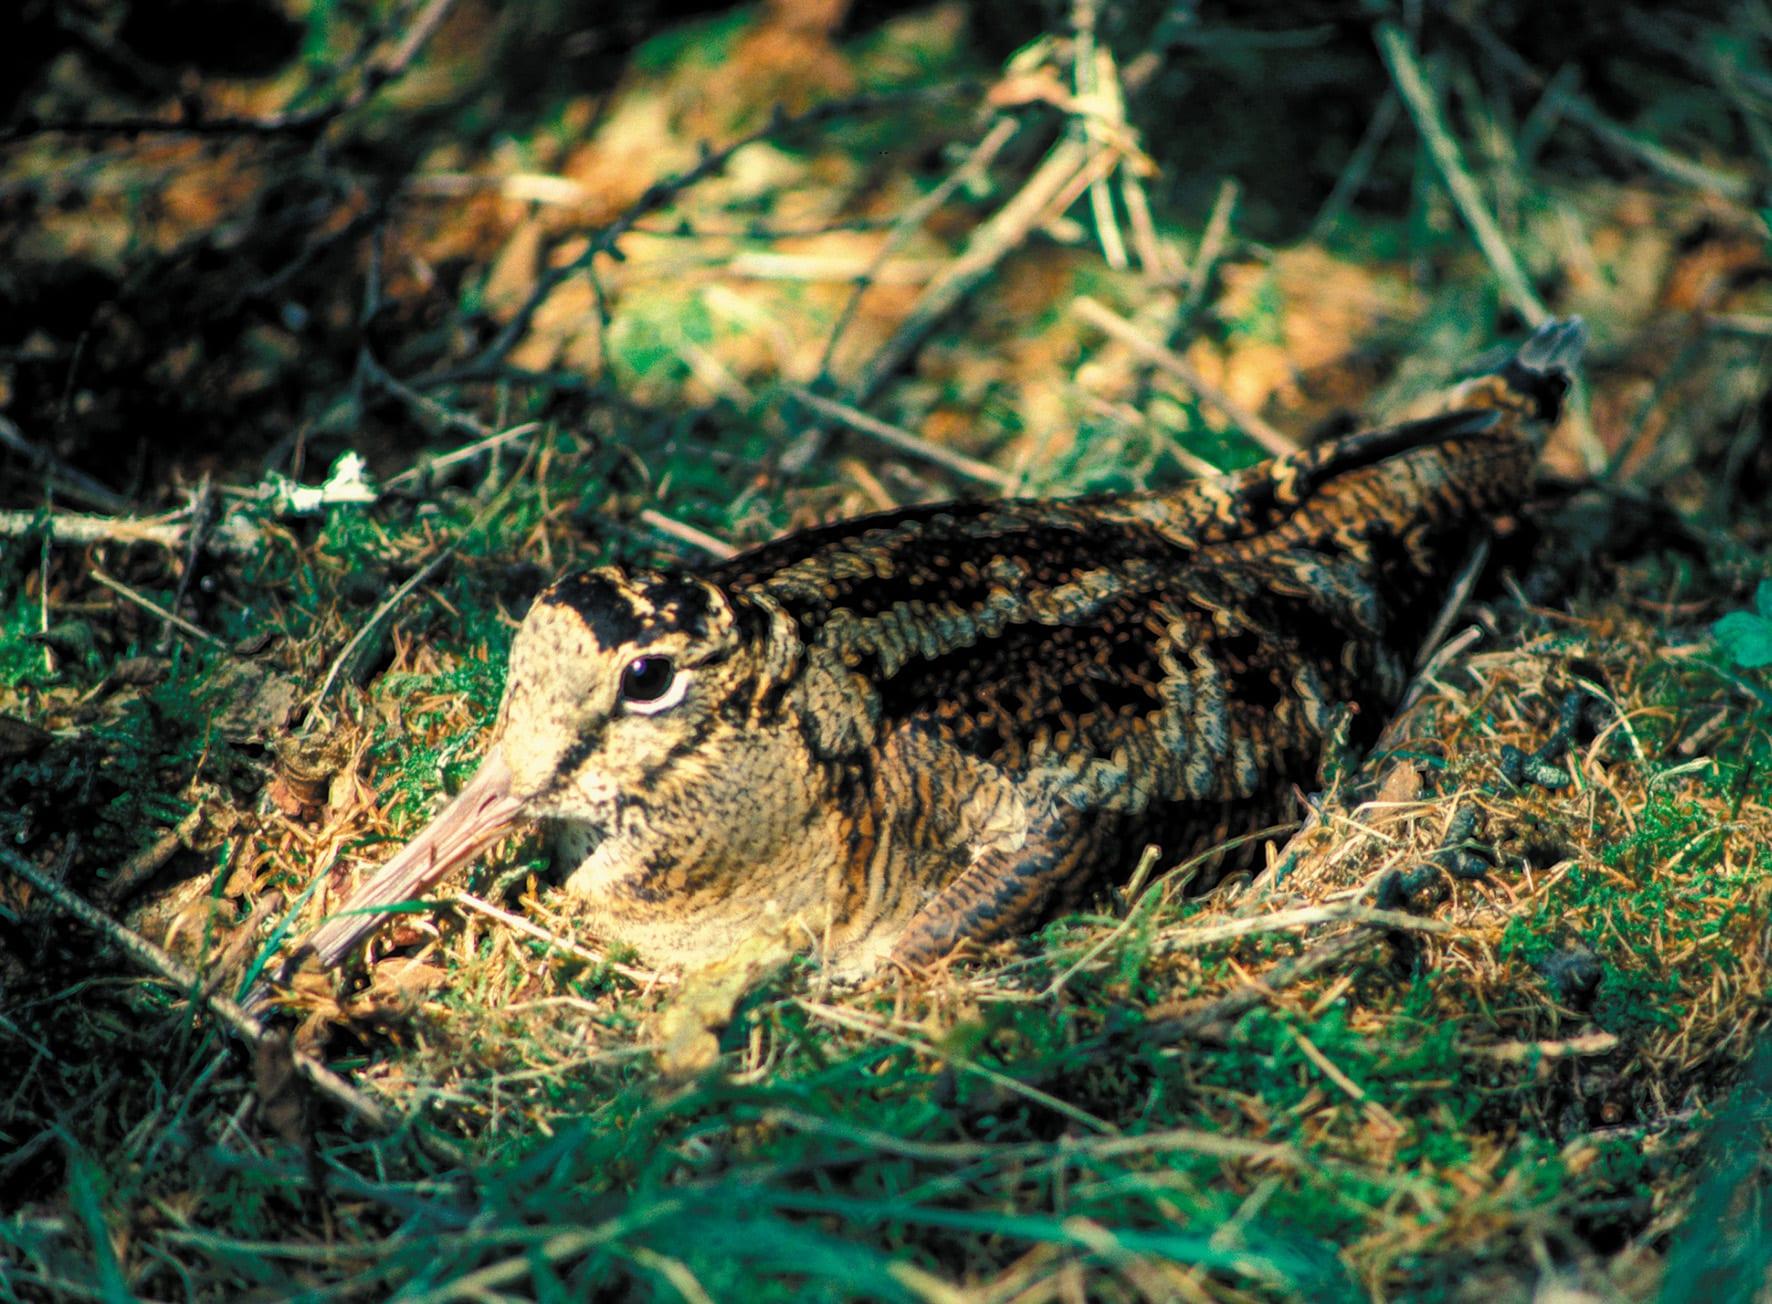 woodcock-sitting-on-nest